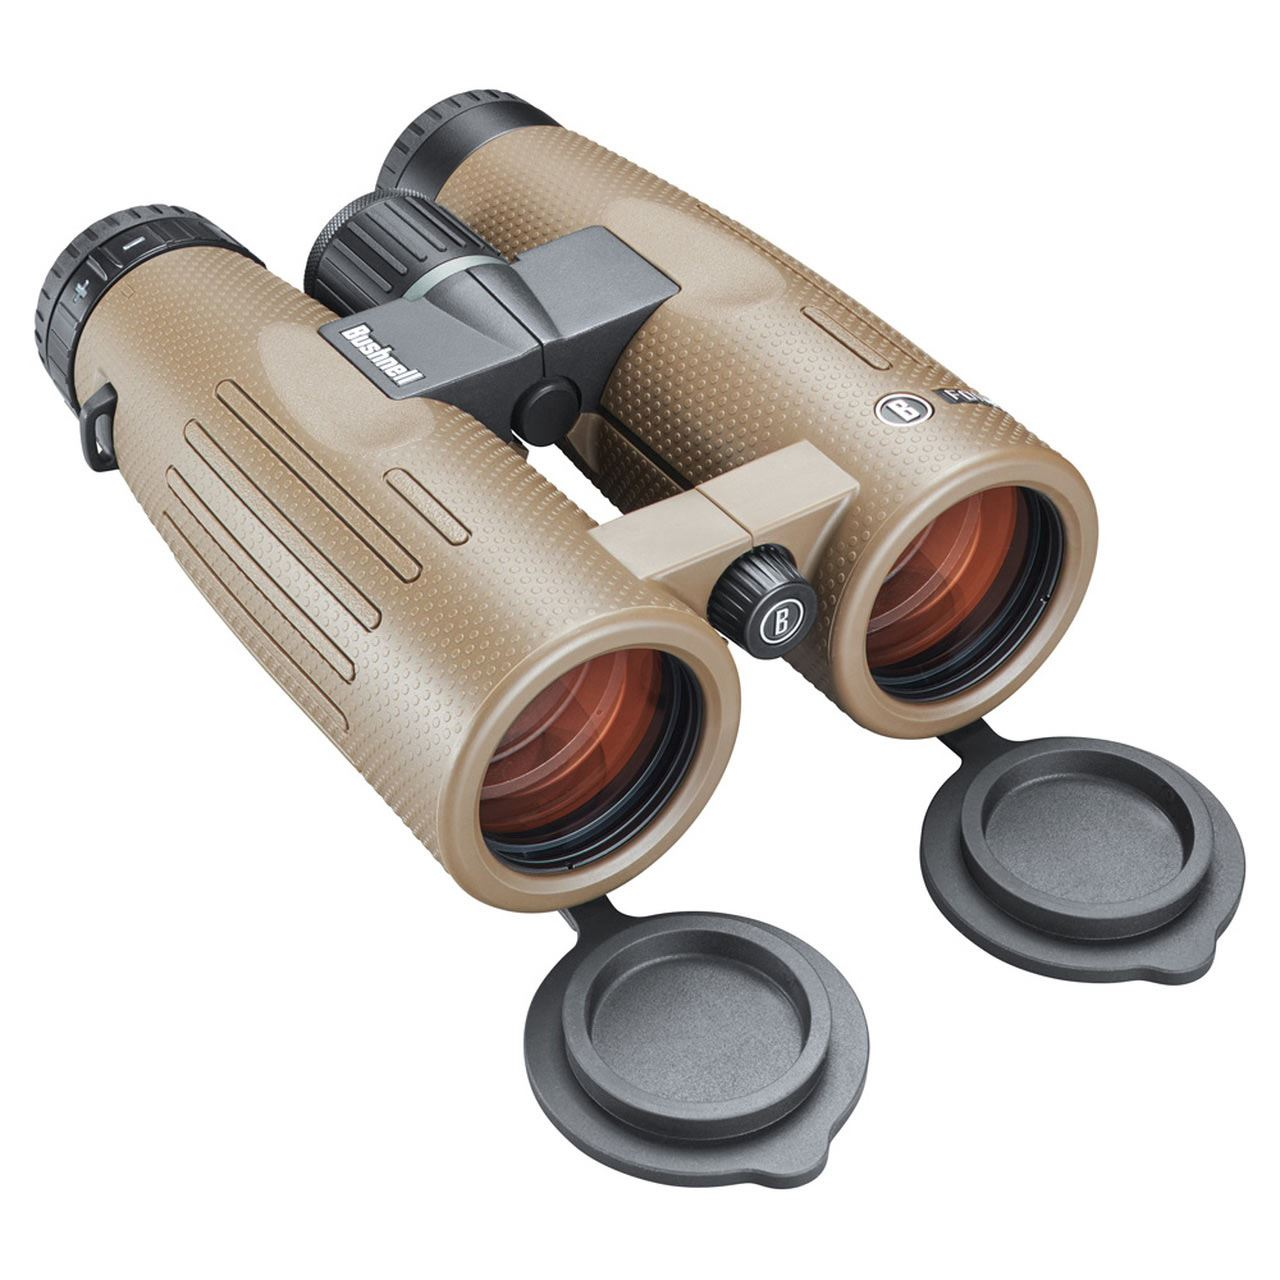 Image of Bushnell Forge 10x42 Binoculars